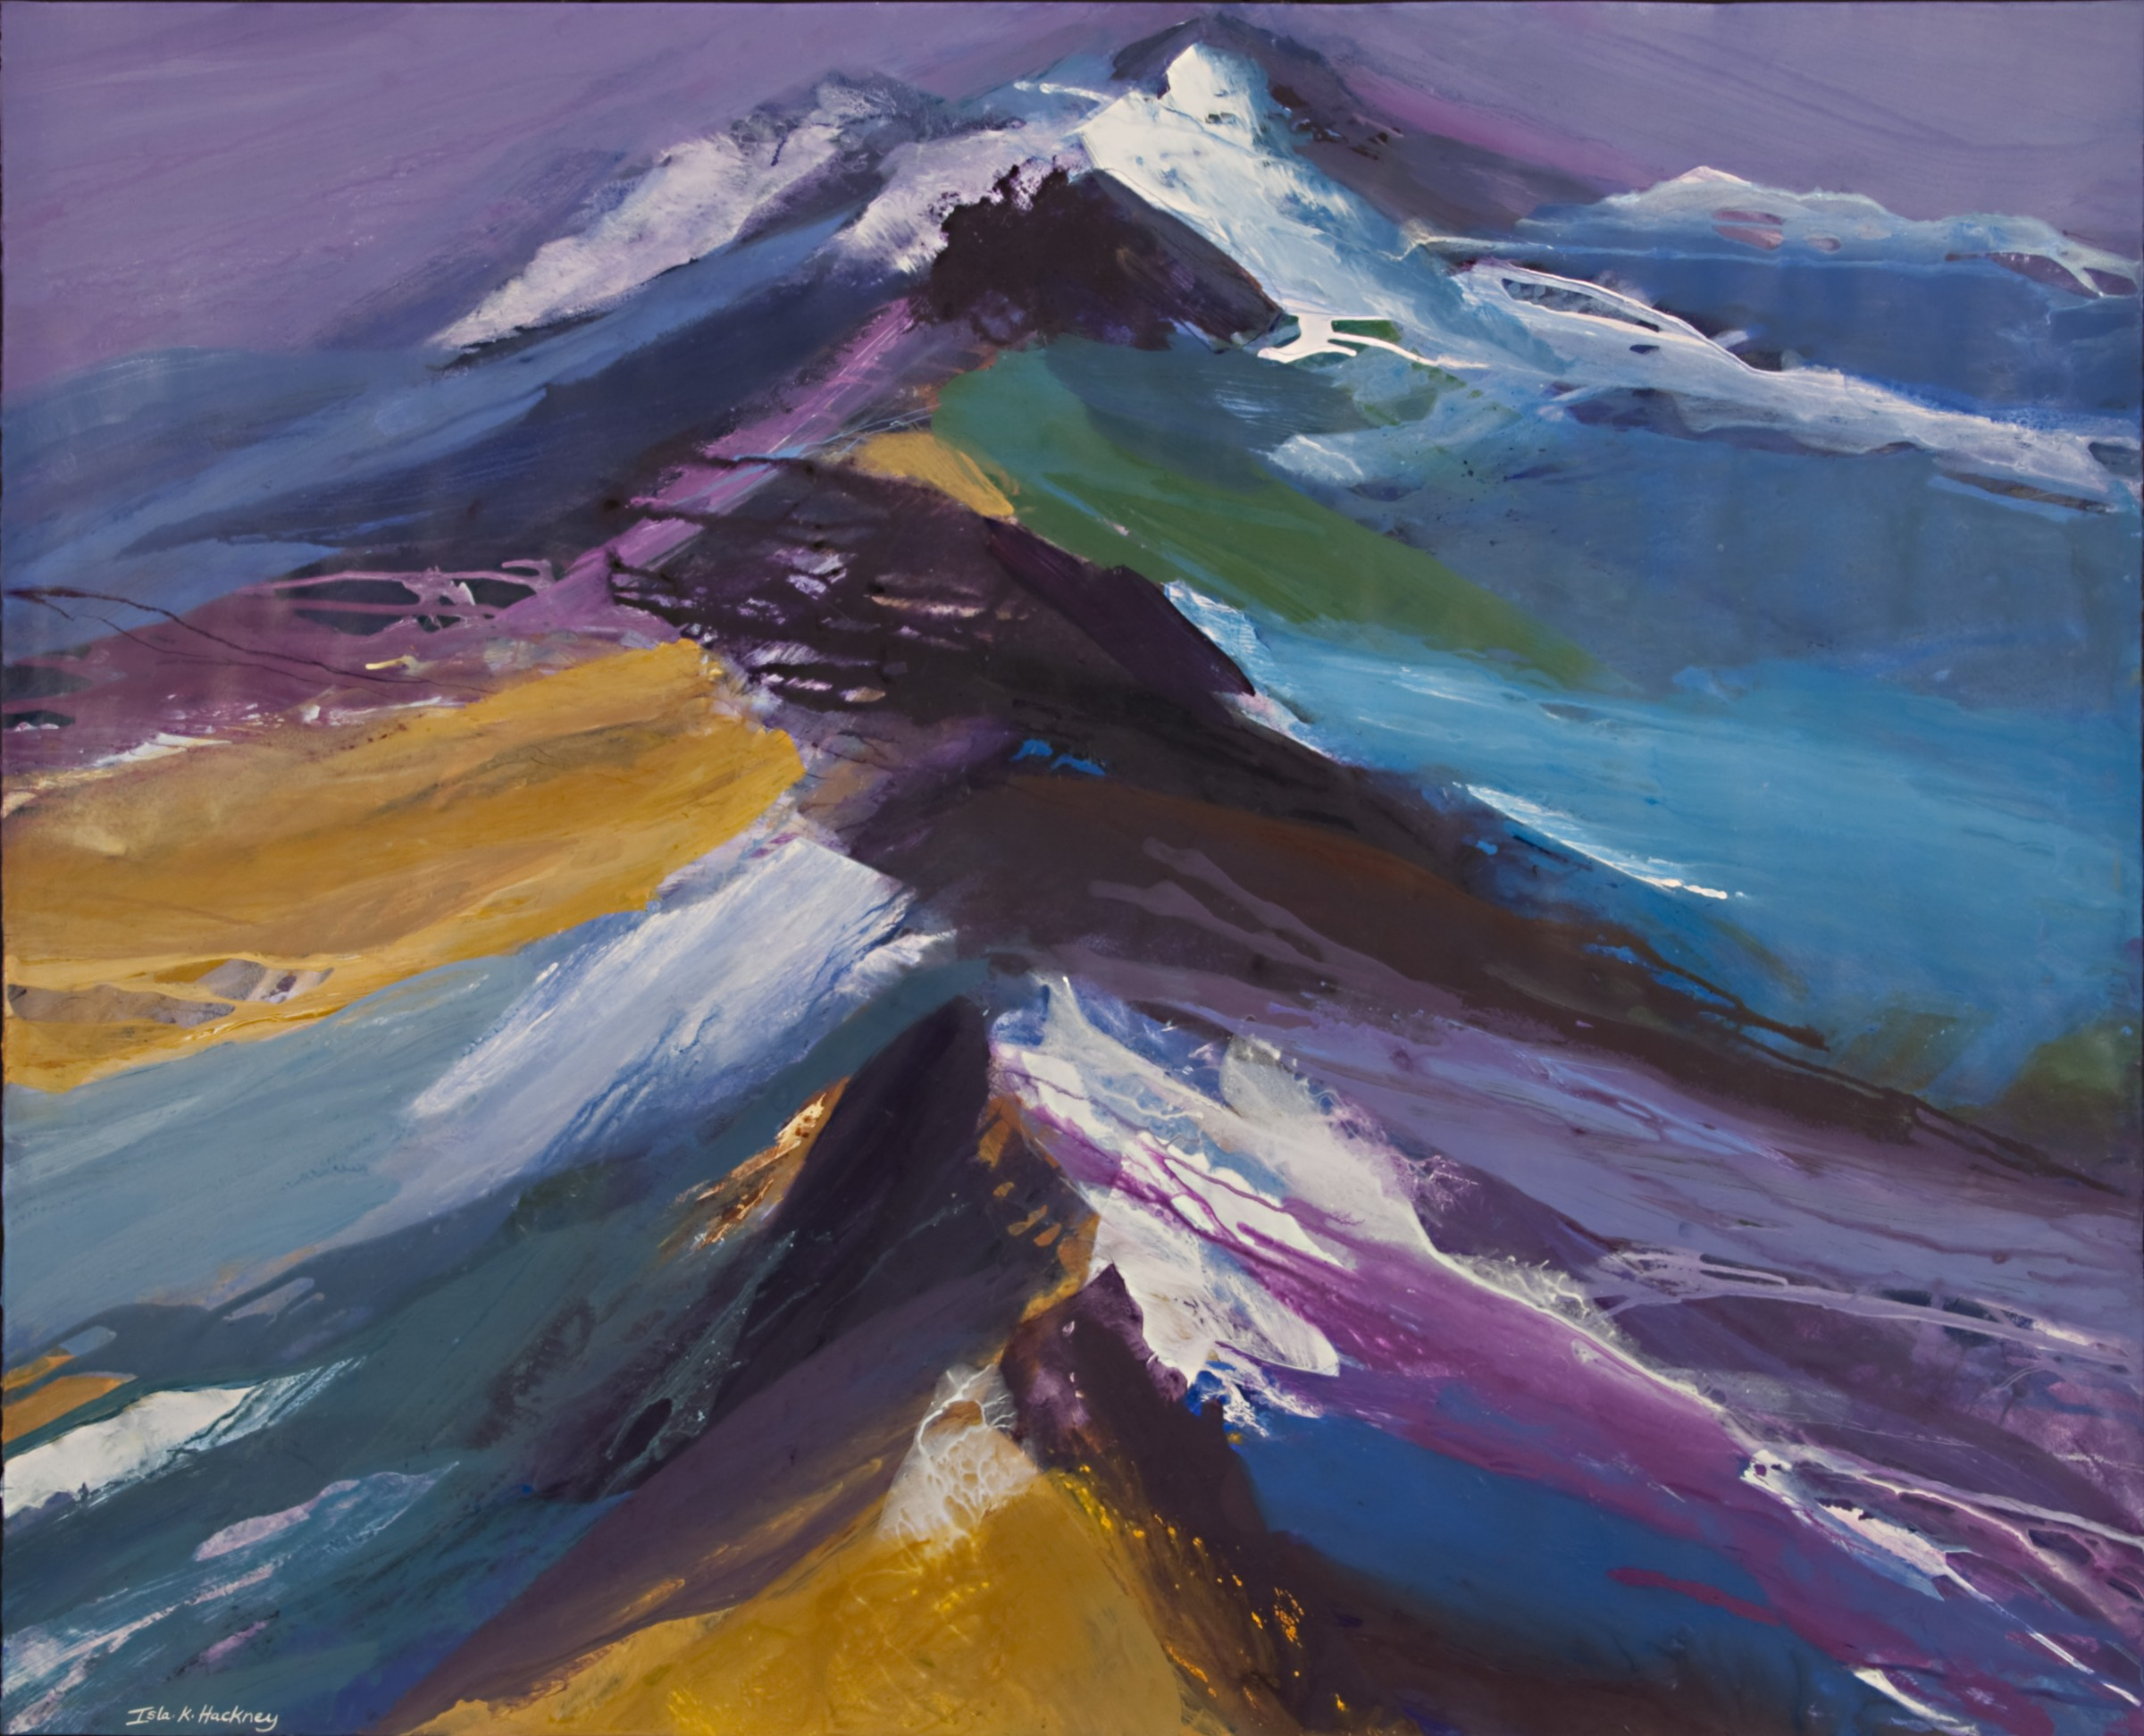 "<span class=""link fancybox-details-link""><a href=""/artists/65-isla-hackney/works/9499-isla-hackney-mountain-ridge/"">View Detail Page</a></span><div class=""artist""><span class=""artist""><strong>Isla Hackney</strong></span></div><div class=""title""><em>Mountain Ridge</em></div><div class=""medium"">acrylic</div><div class=""price"">£6,000.00</div>"